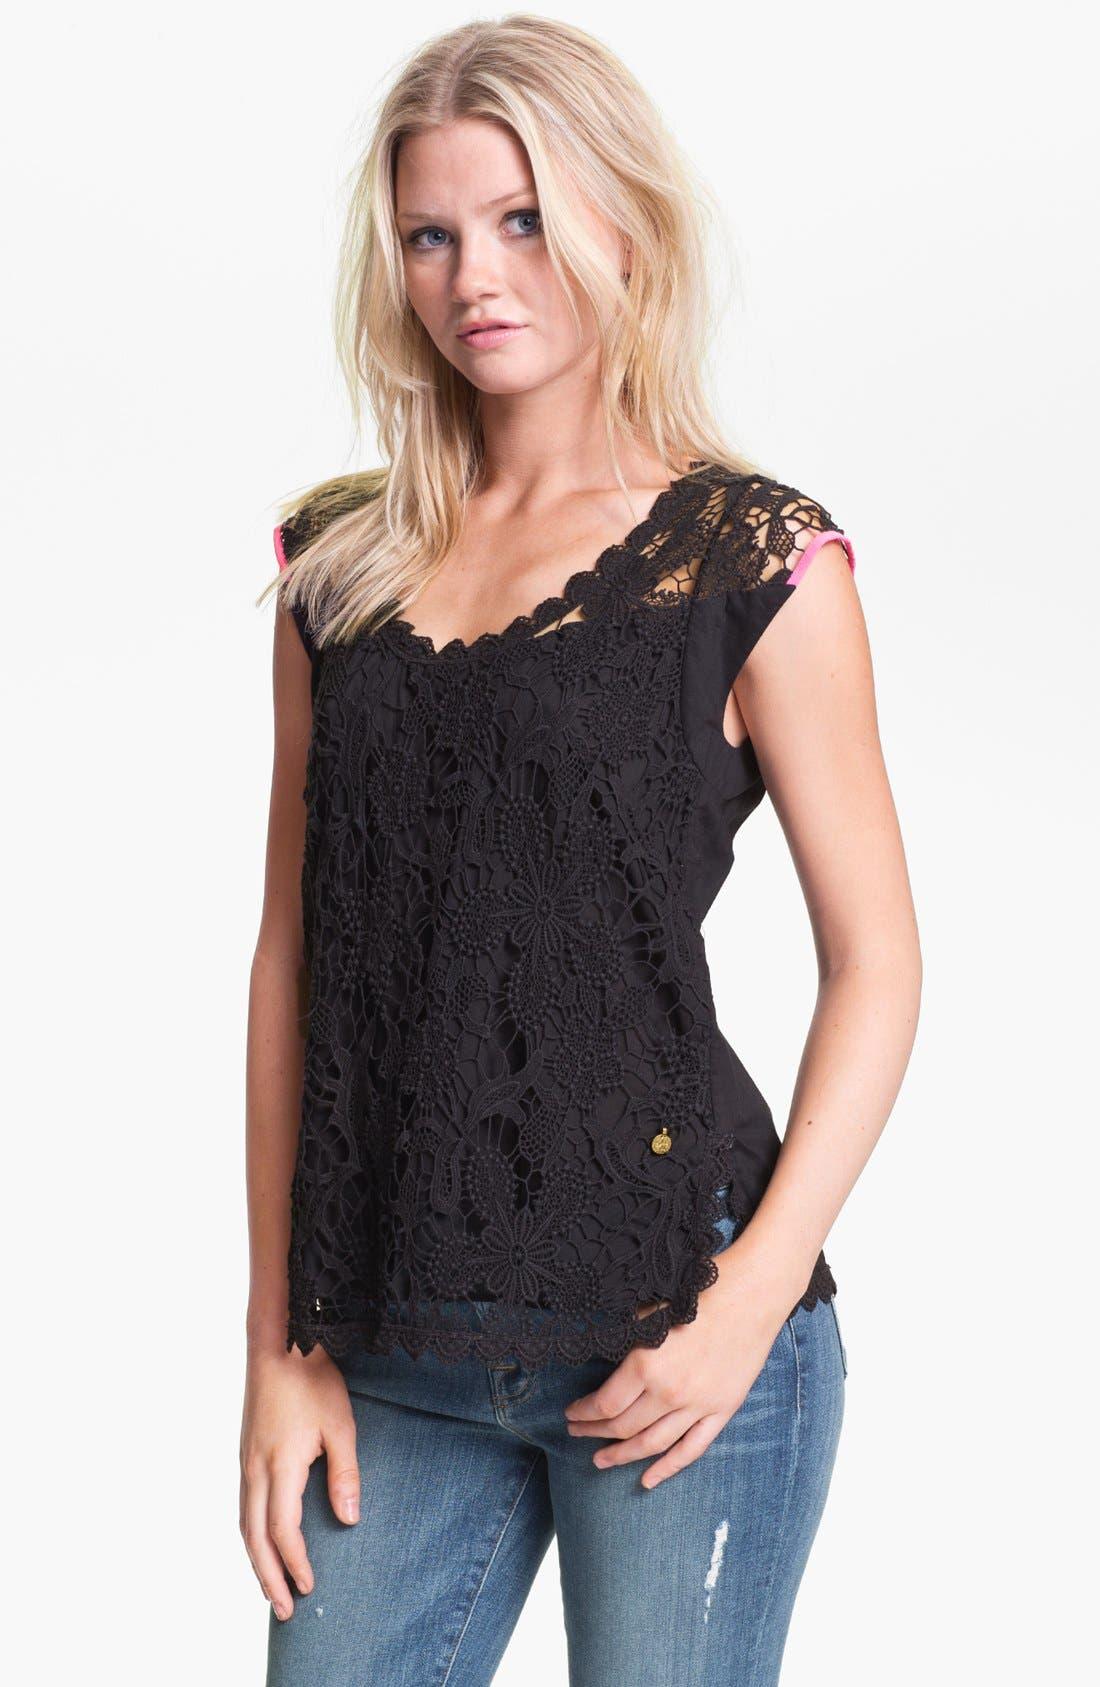 Alternate Image 1 Selected - Maison Scotch Crochet Top